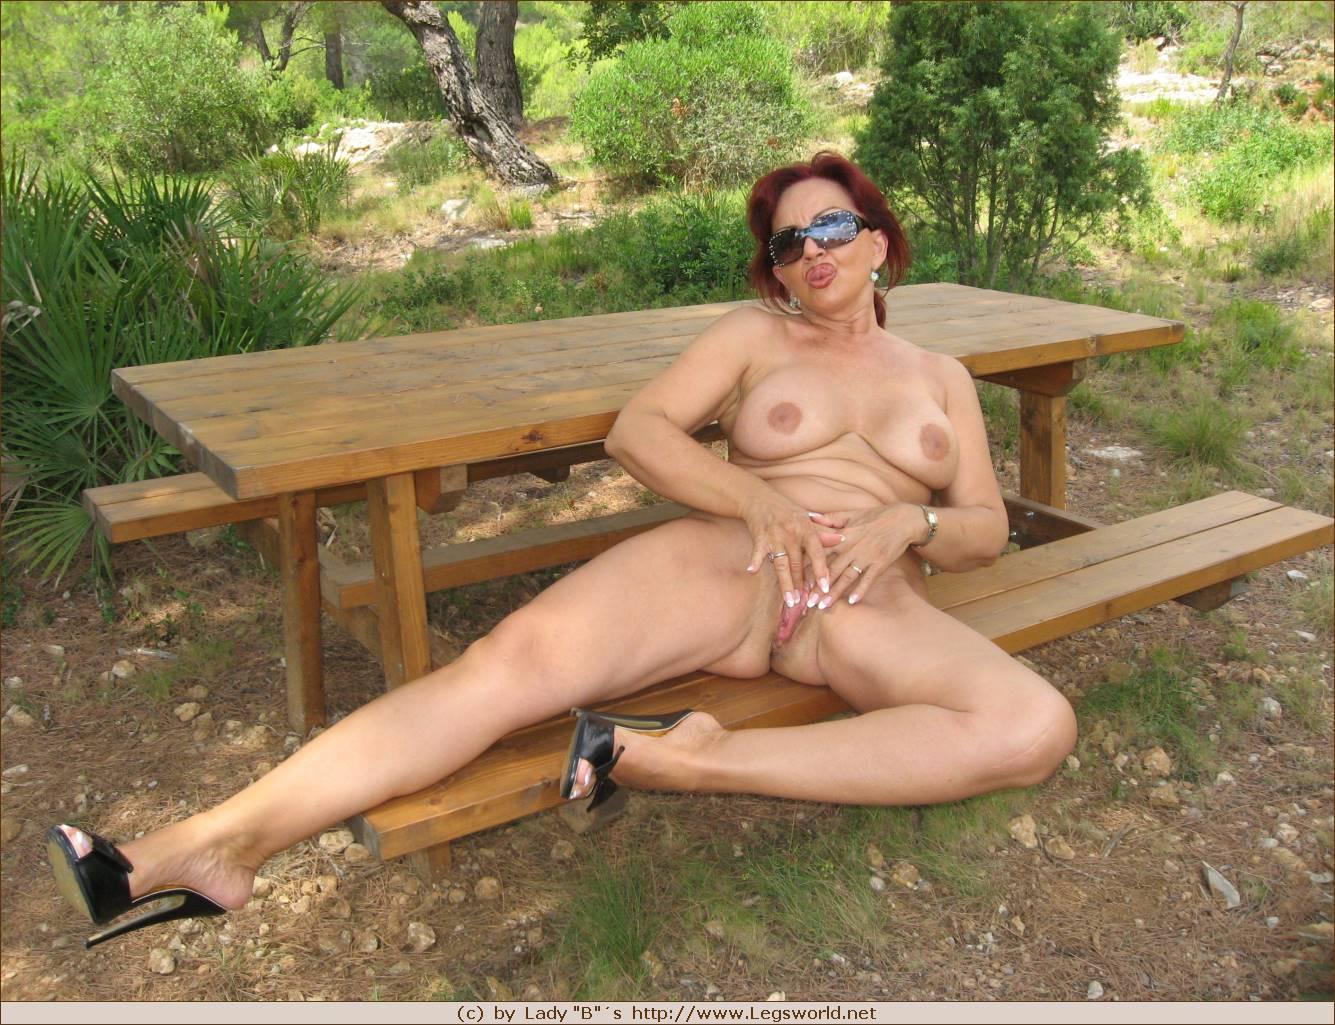 Lady barbara legsworld idea and